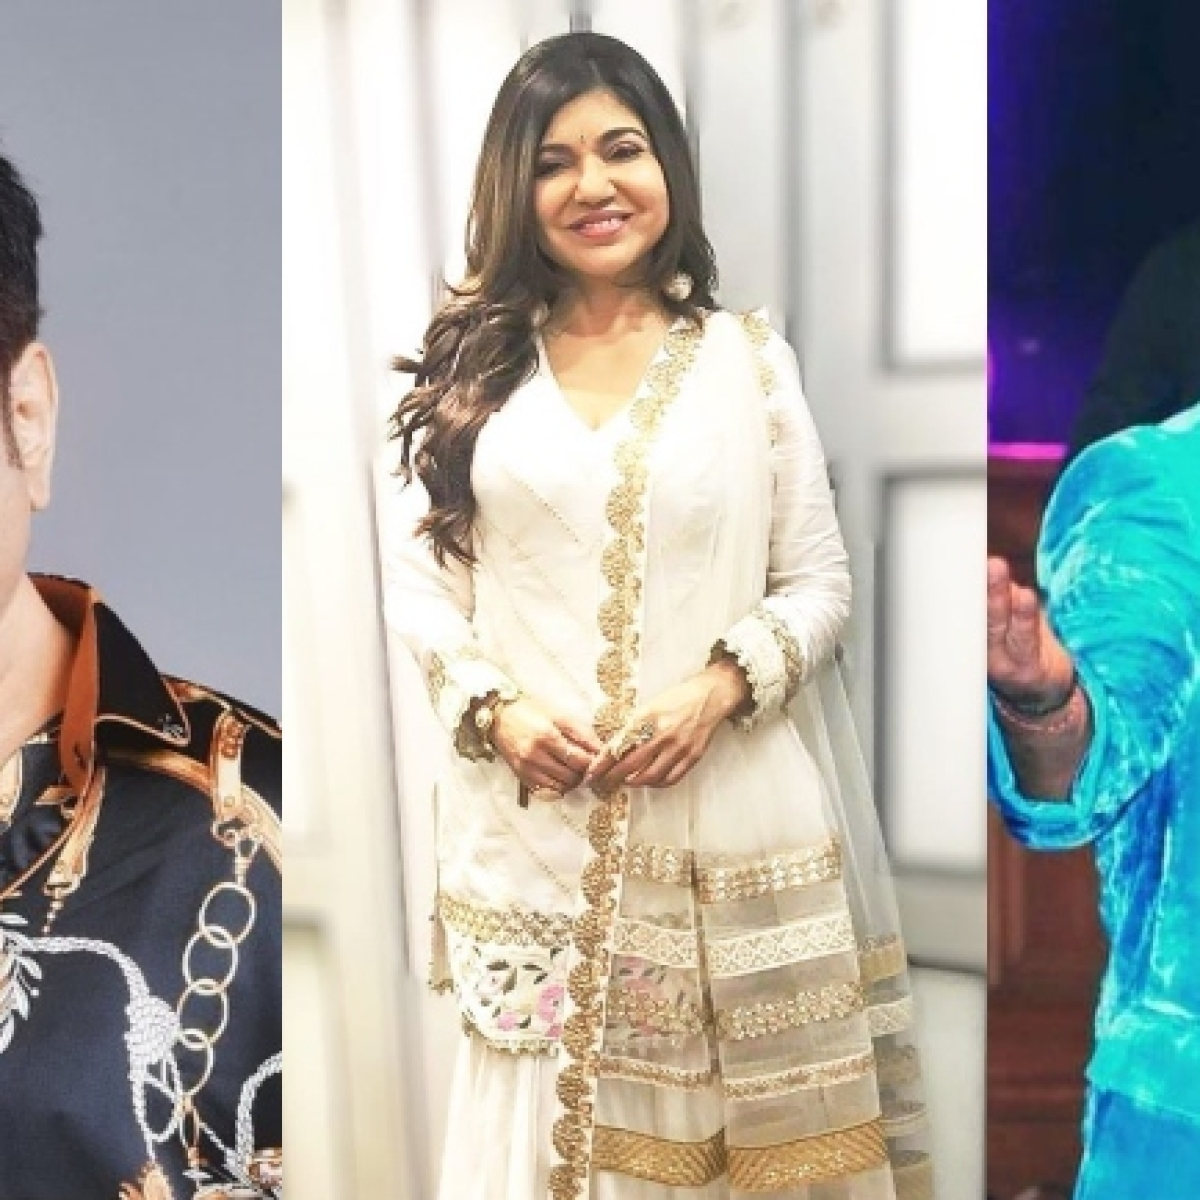 FWICE urges Alka Yagnik, Udit Narayan, Kumar Sanu to cancel US show organised by Pakistani